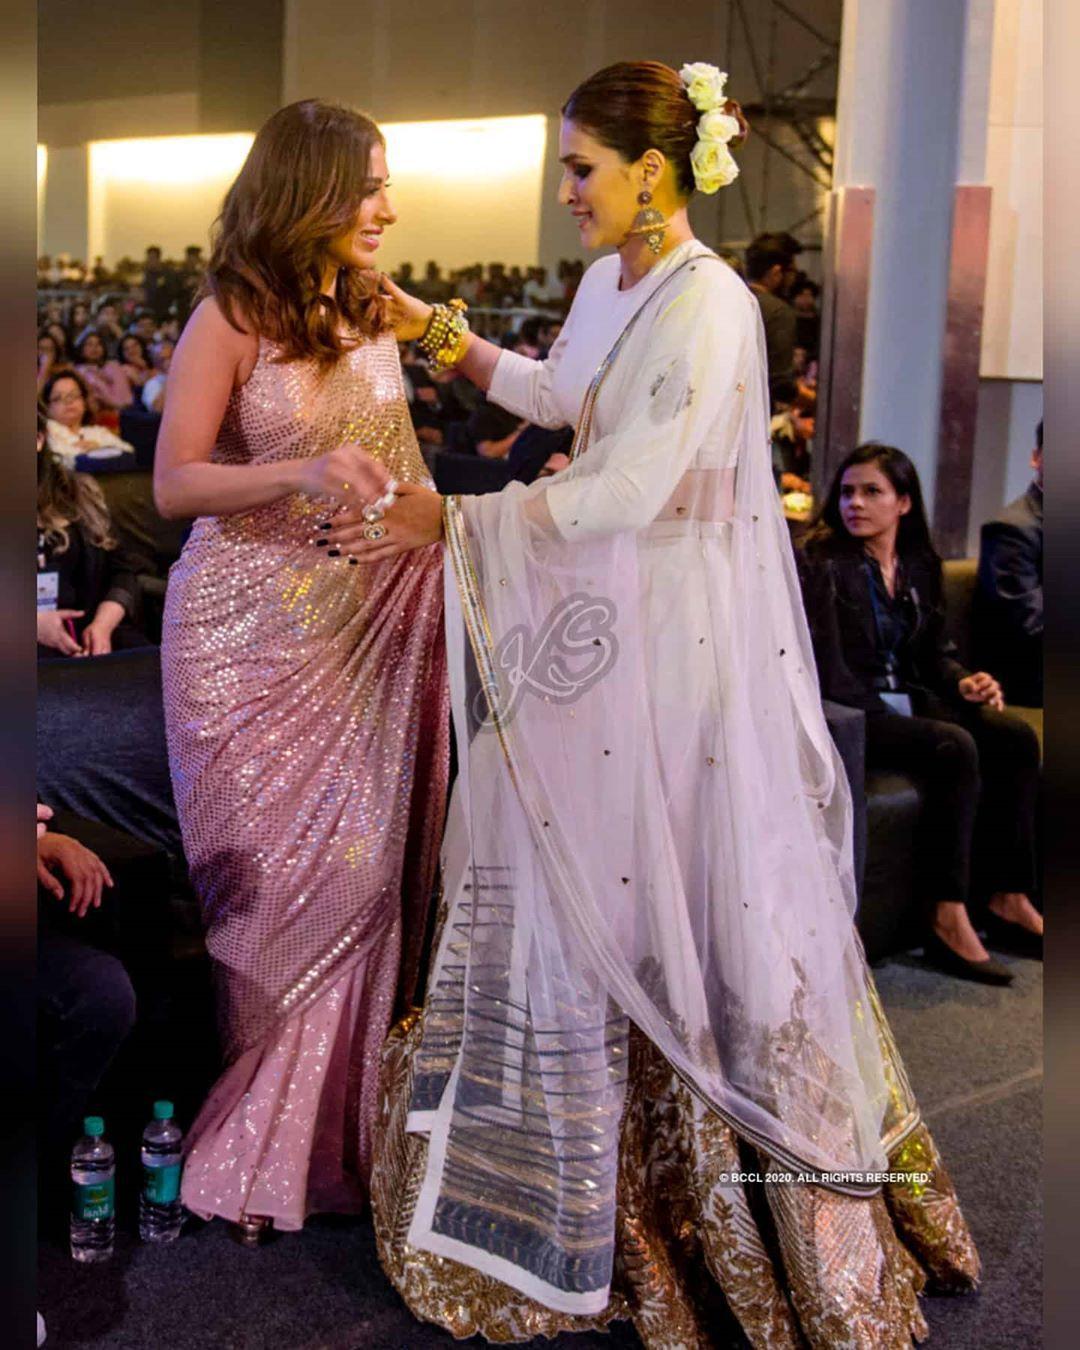 Pin on Bollywood gossip